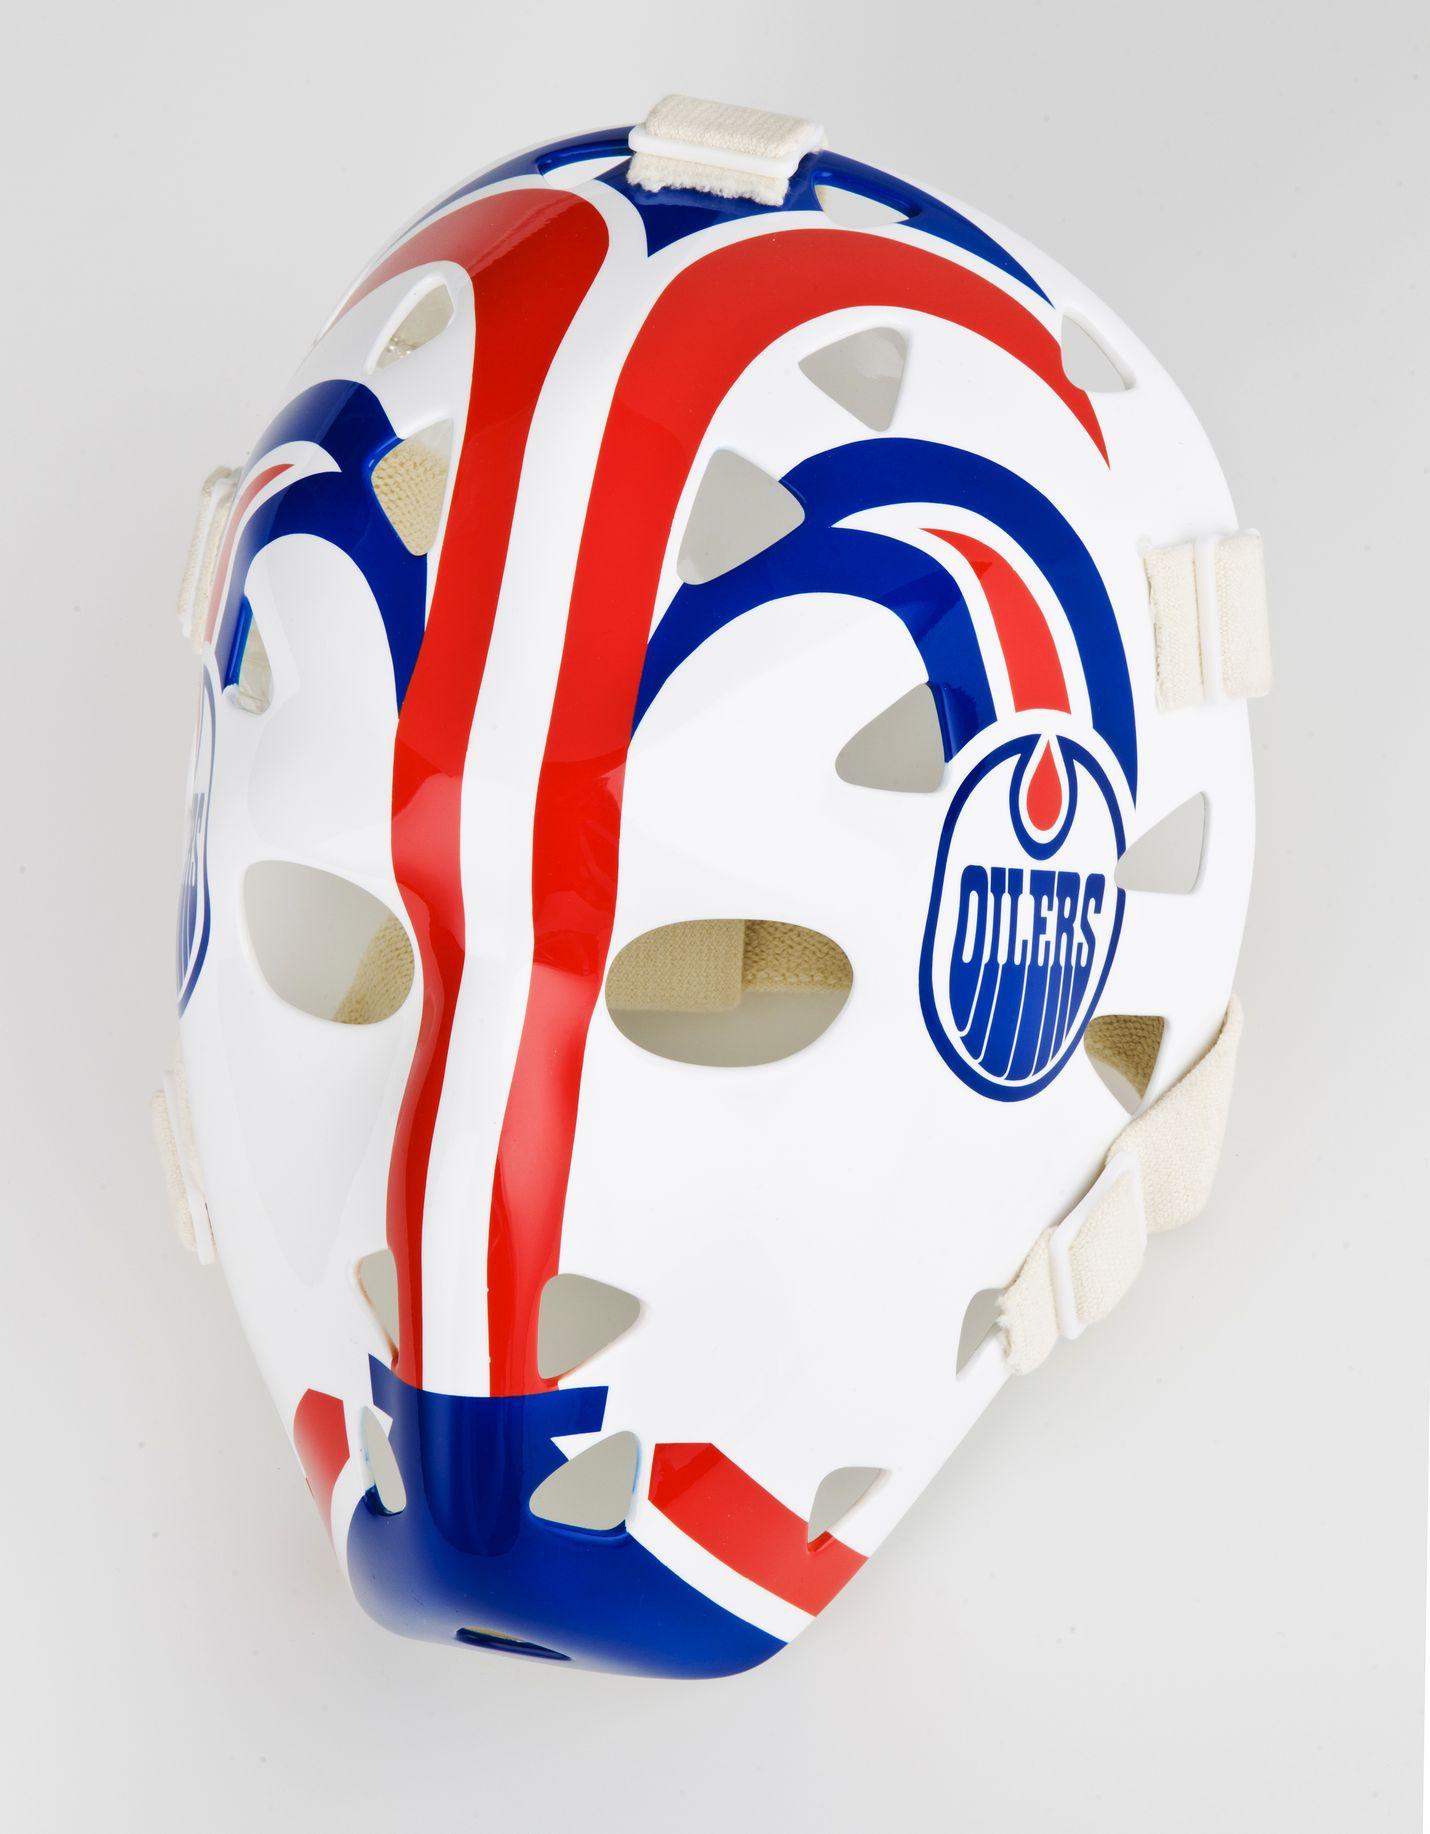 Kenen maski?